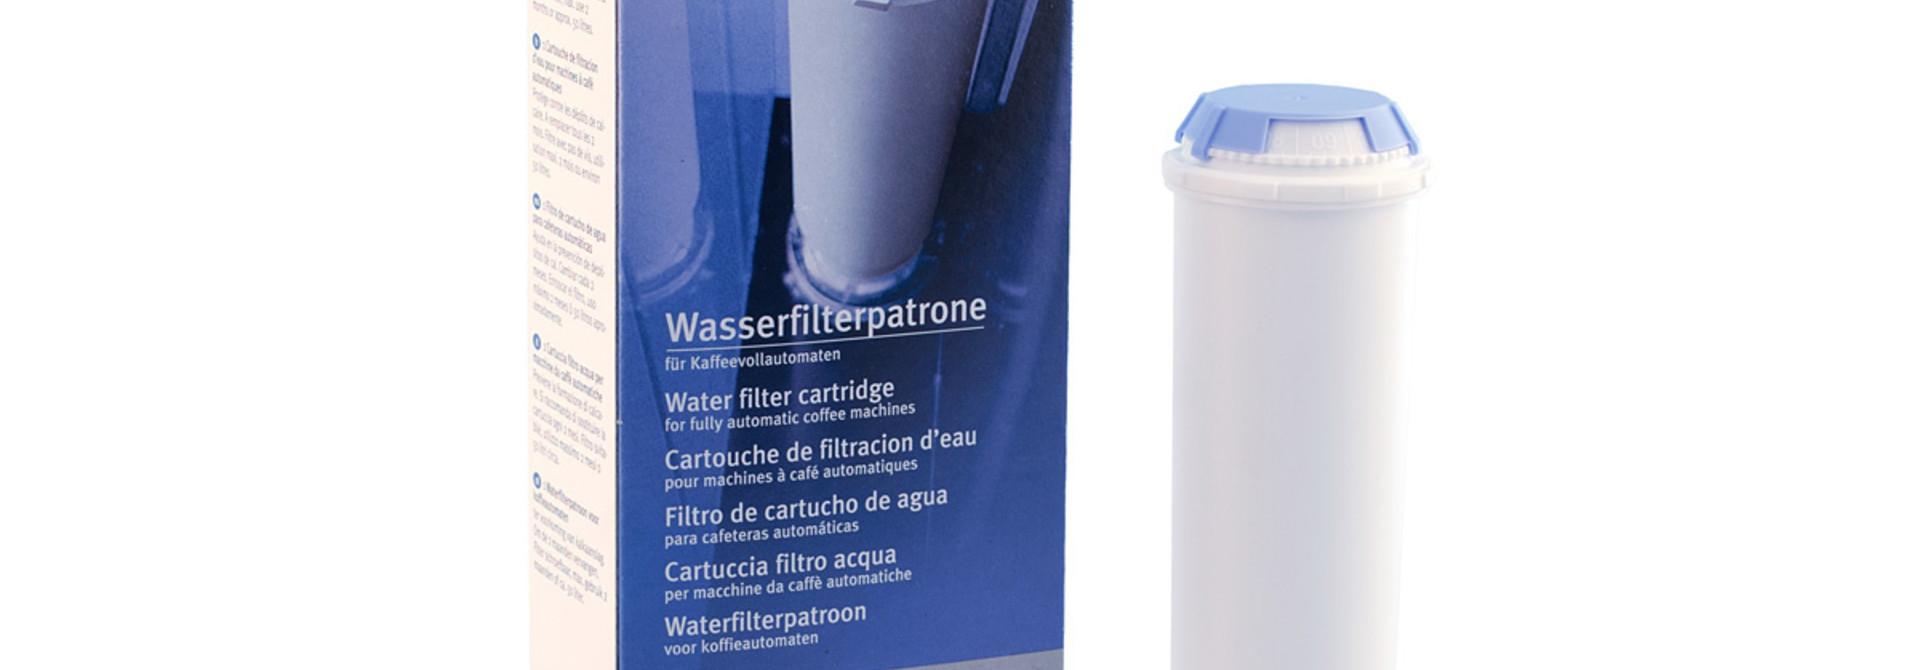 Bosch Claris waterfilter